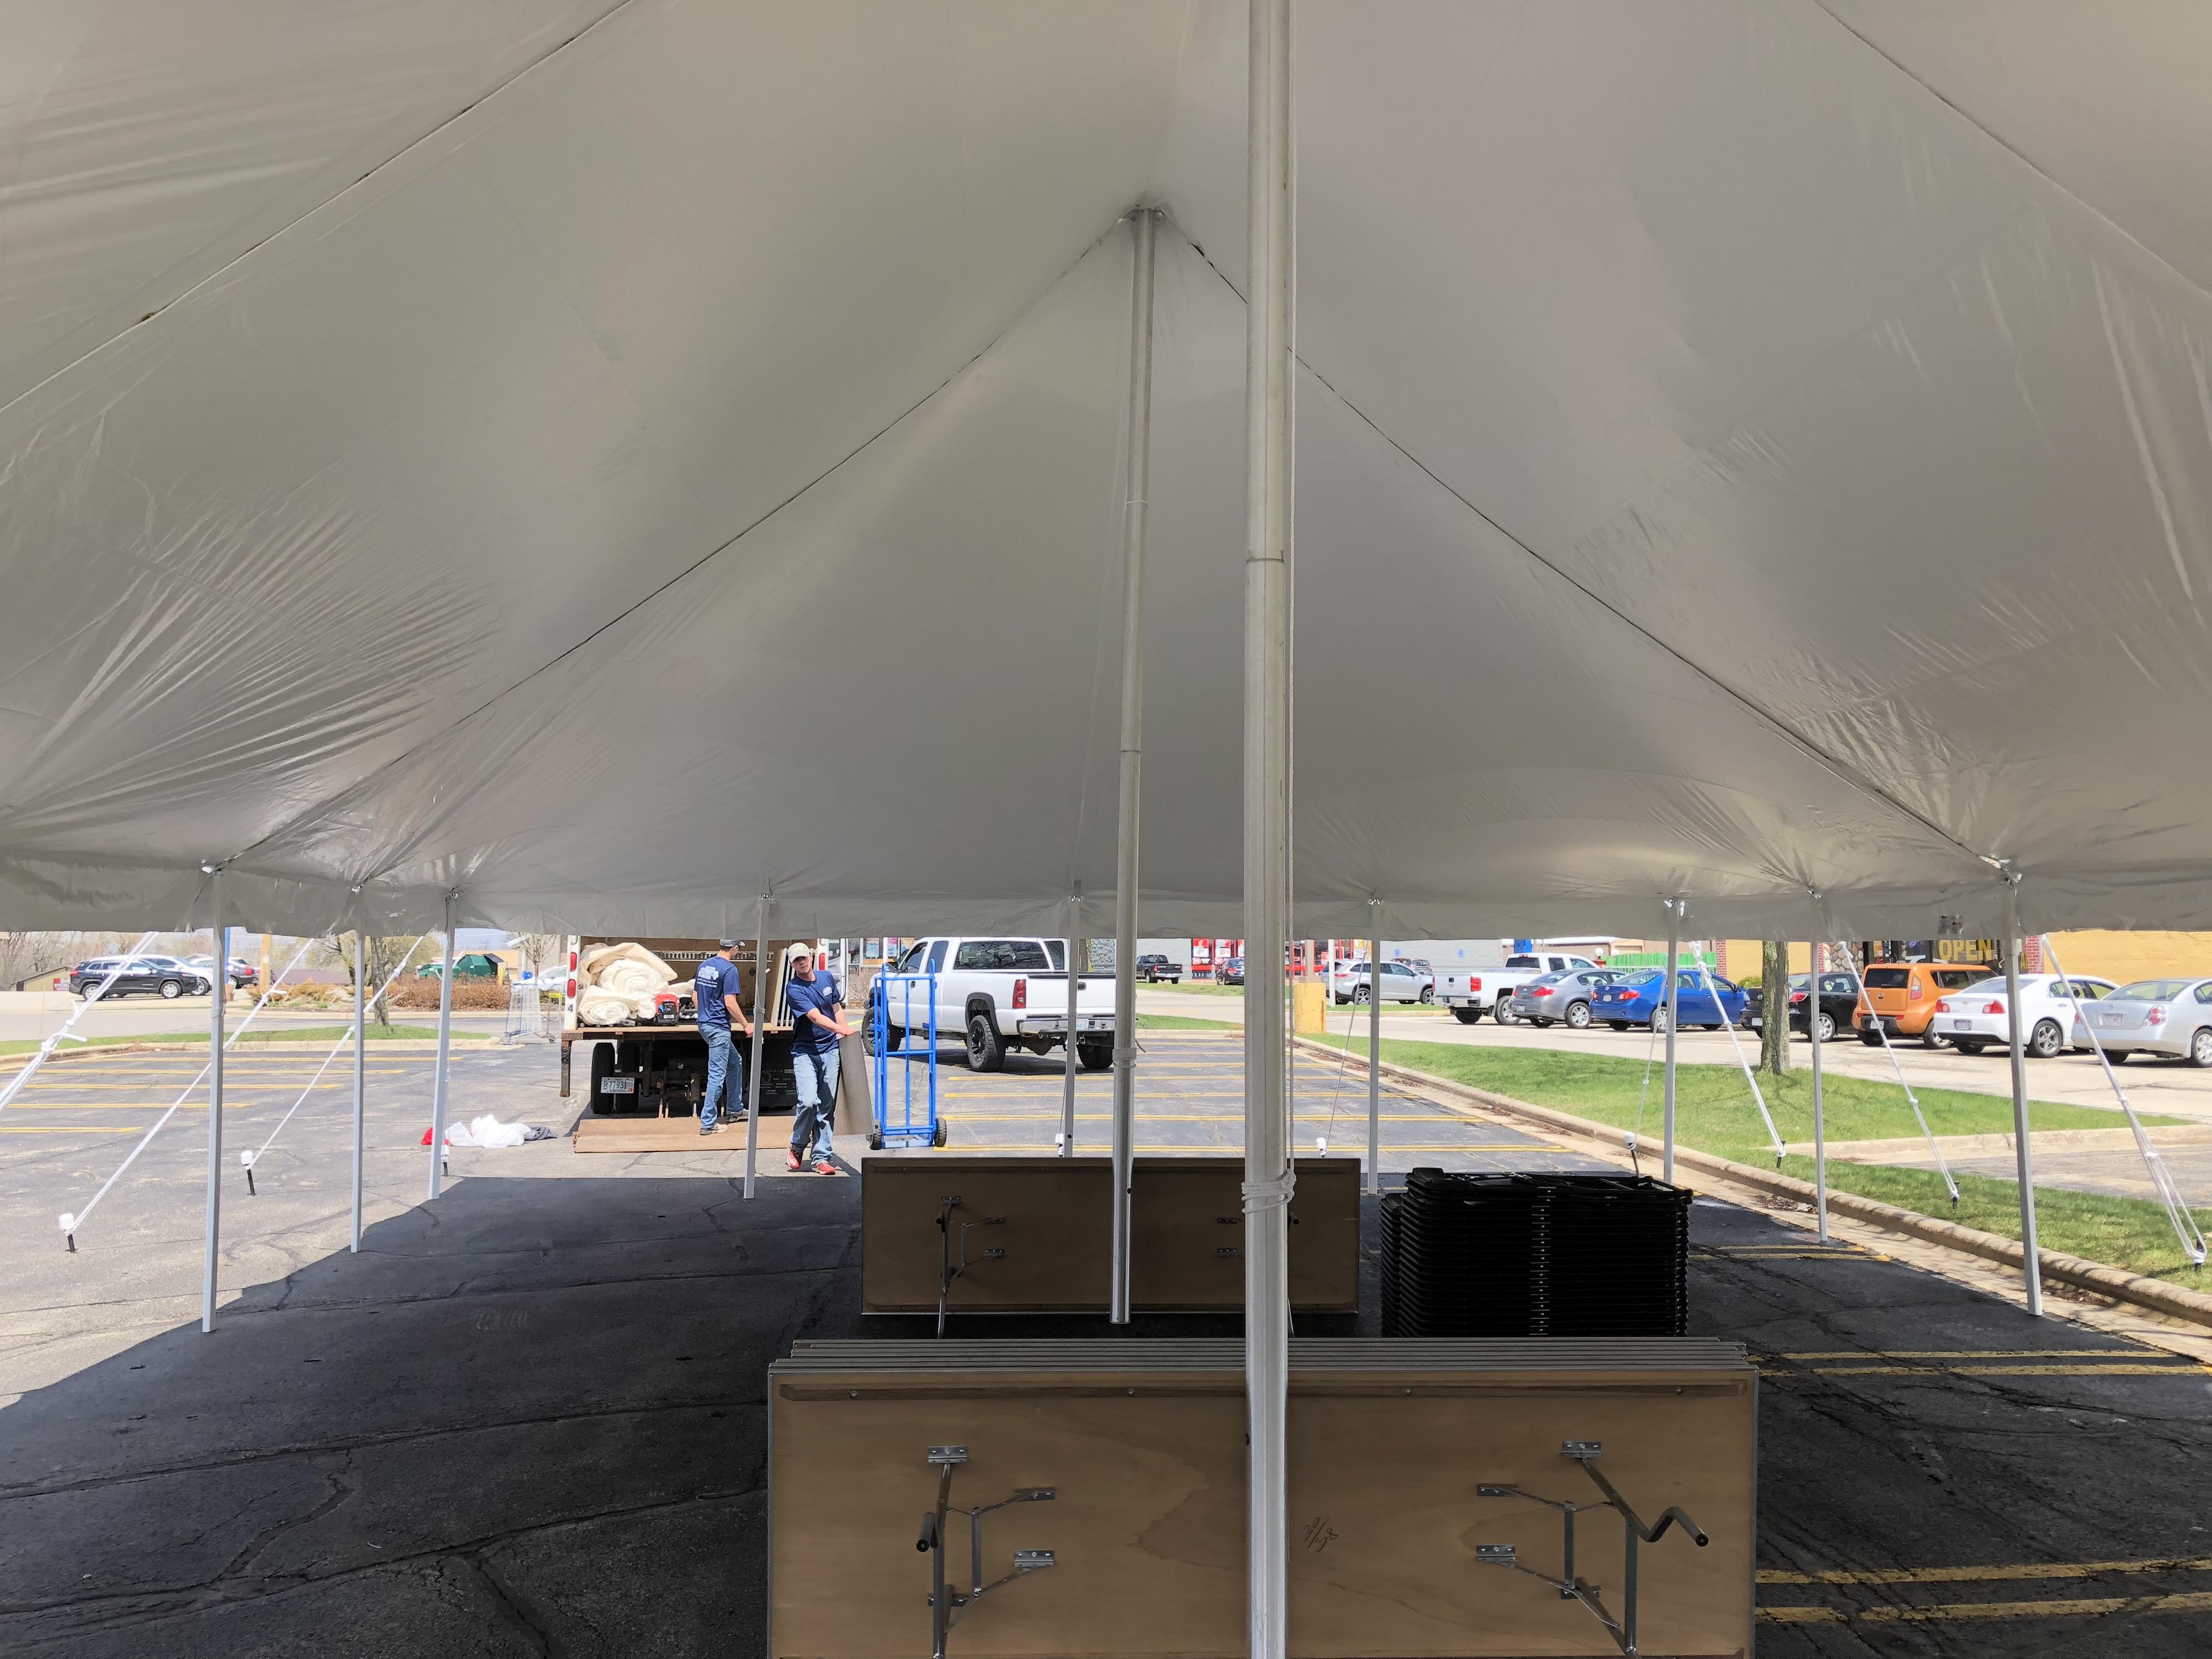 Party Tent Rentals & Wedding Tent Rentals in Northeastern WI • Appleton